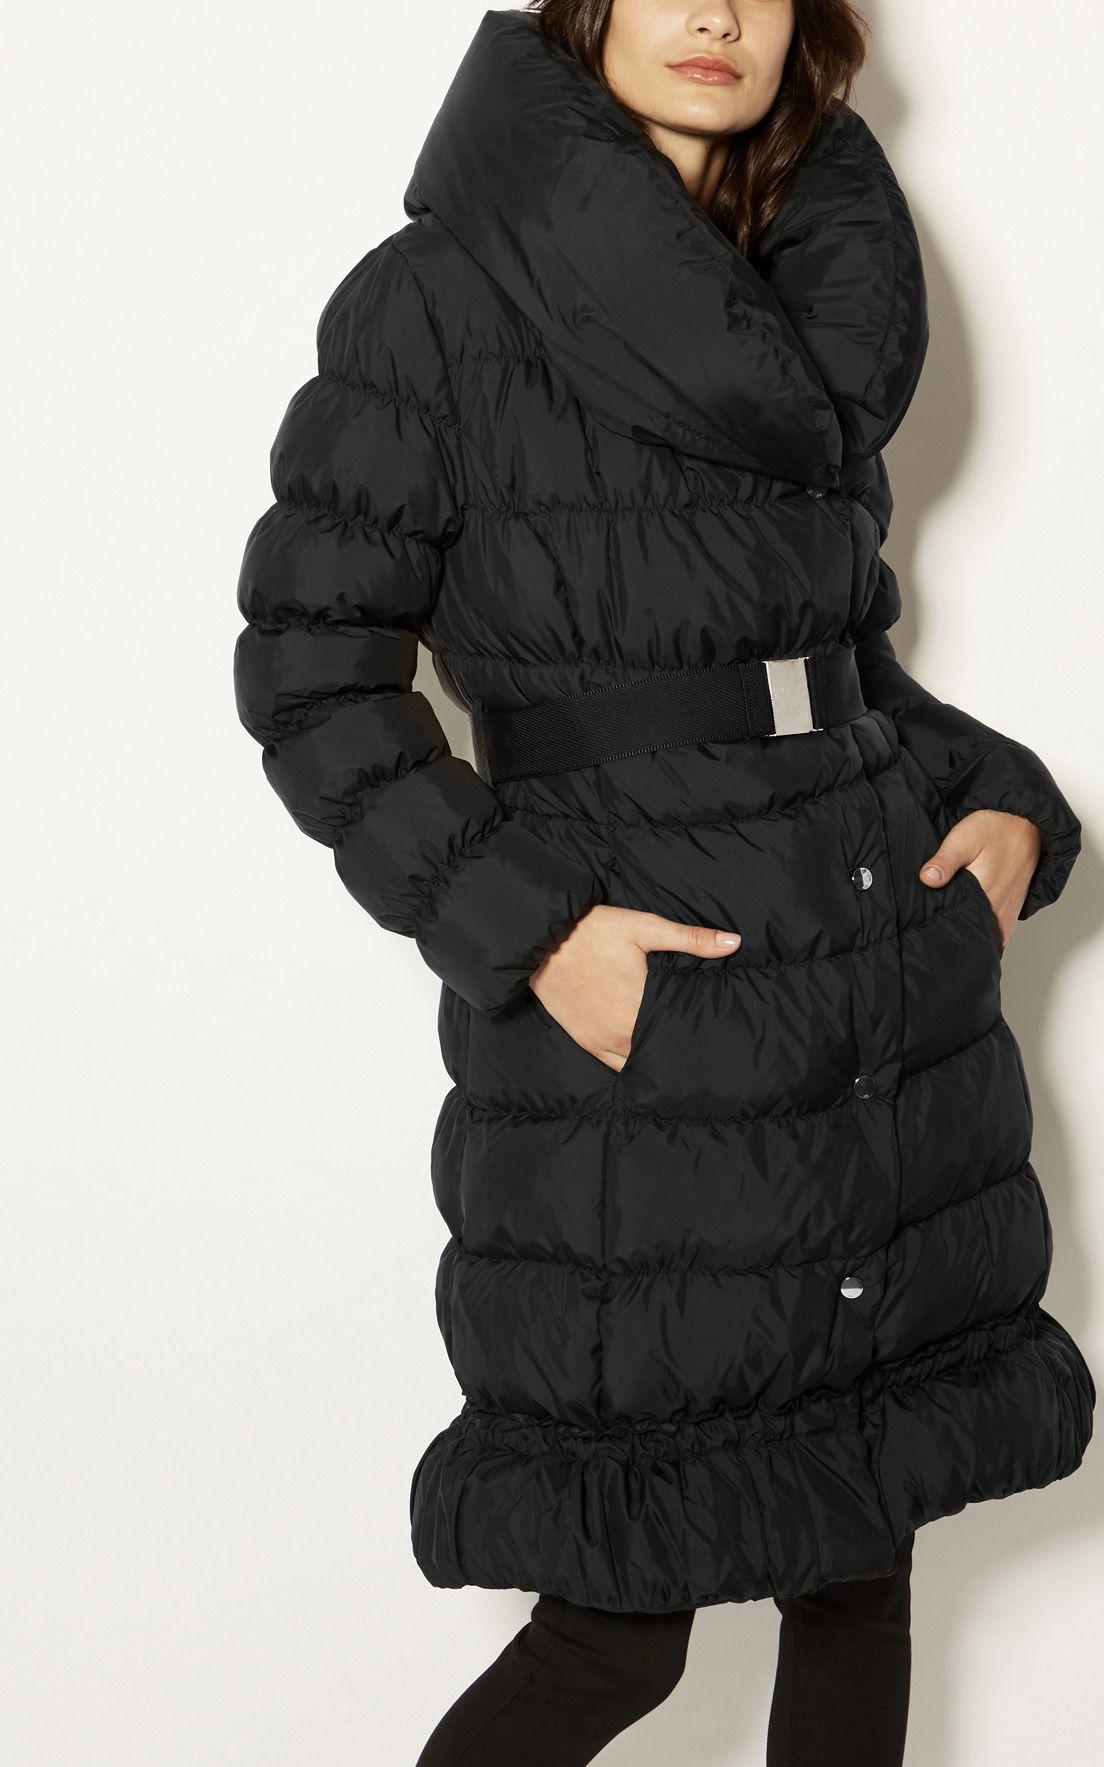 c9972bc5849 Karen Millen, Feather Filled Puffer Coat Black   Coats   Women's ...